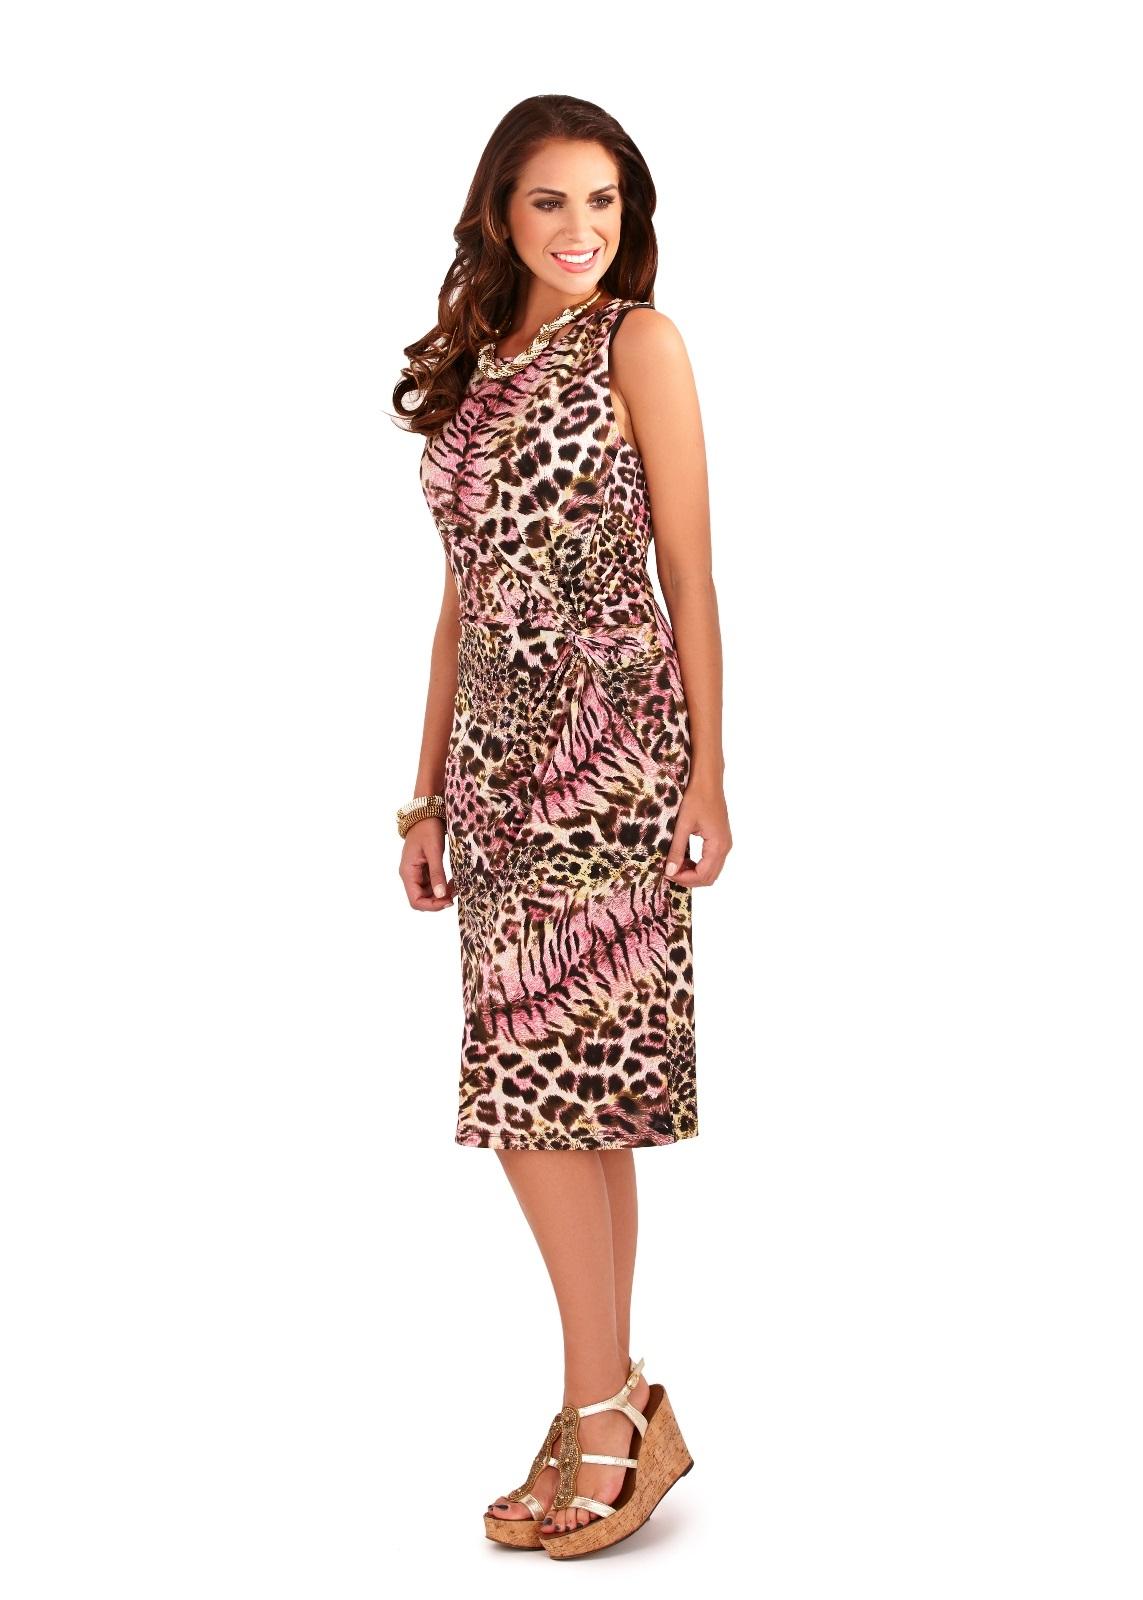 Wonderful Womenu0026#39;s Sexy Lace Dresses Pencil V Neck Slim Cocktail Party Wedding Black White | EBay